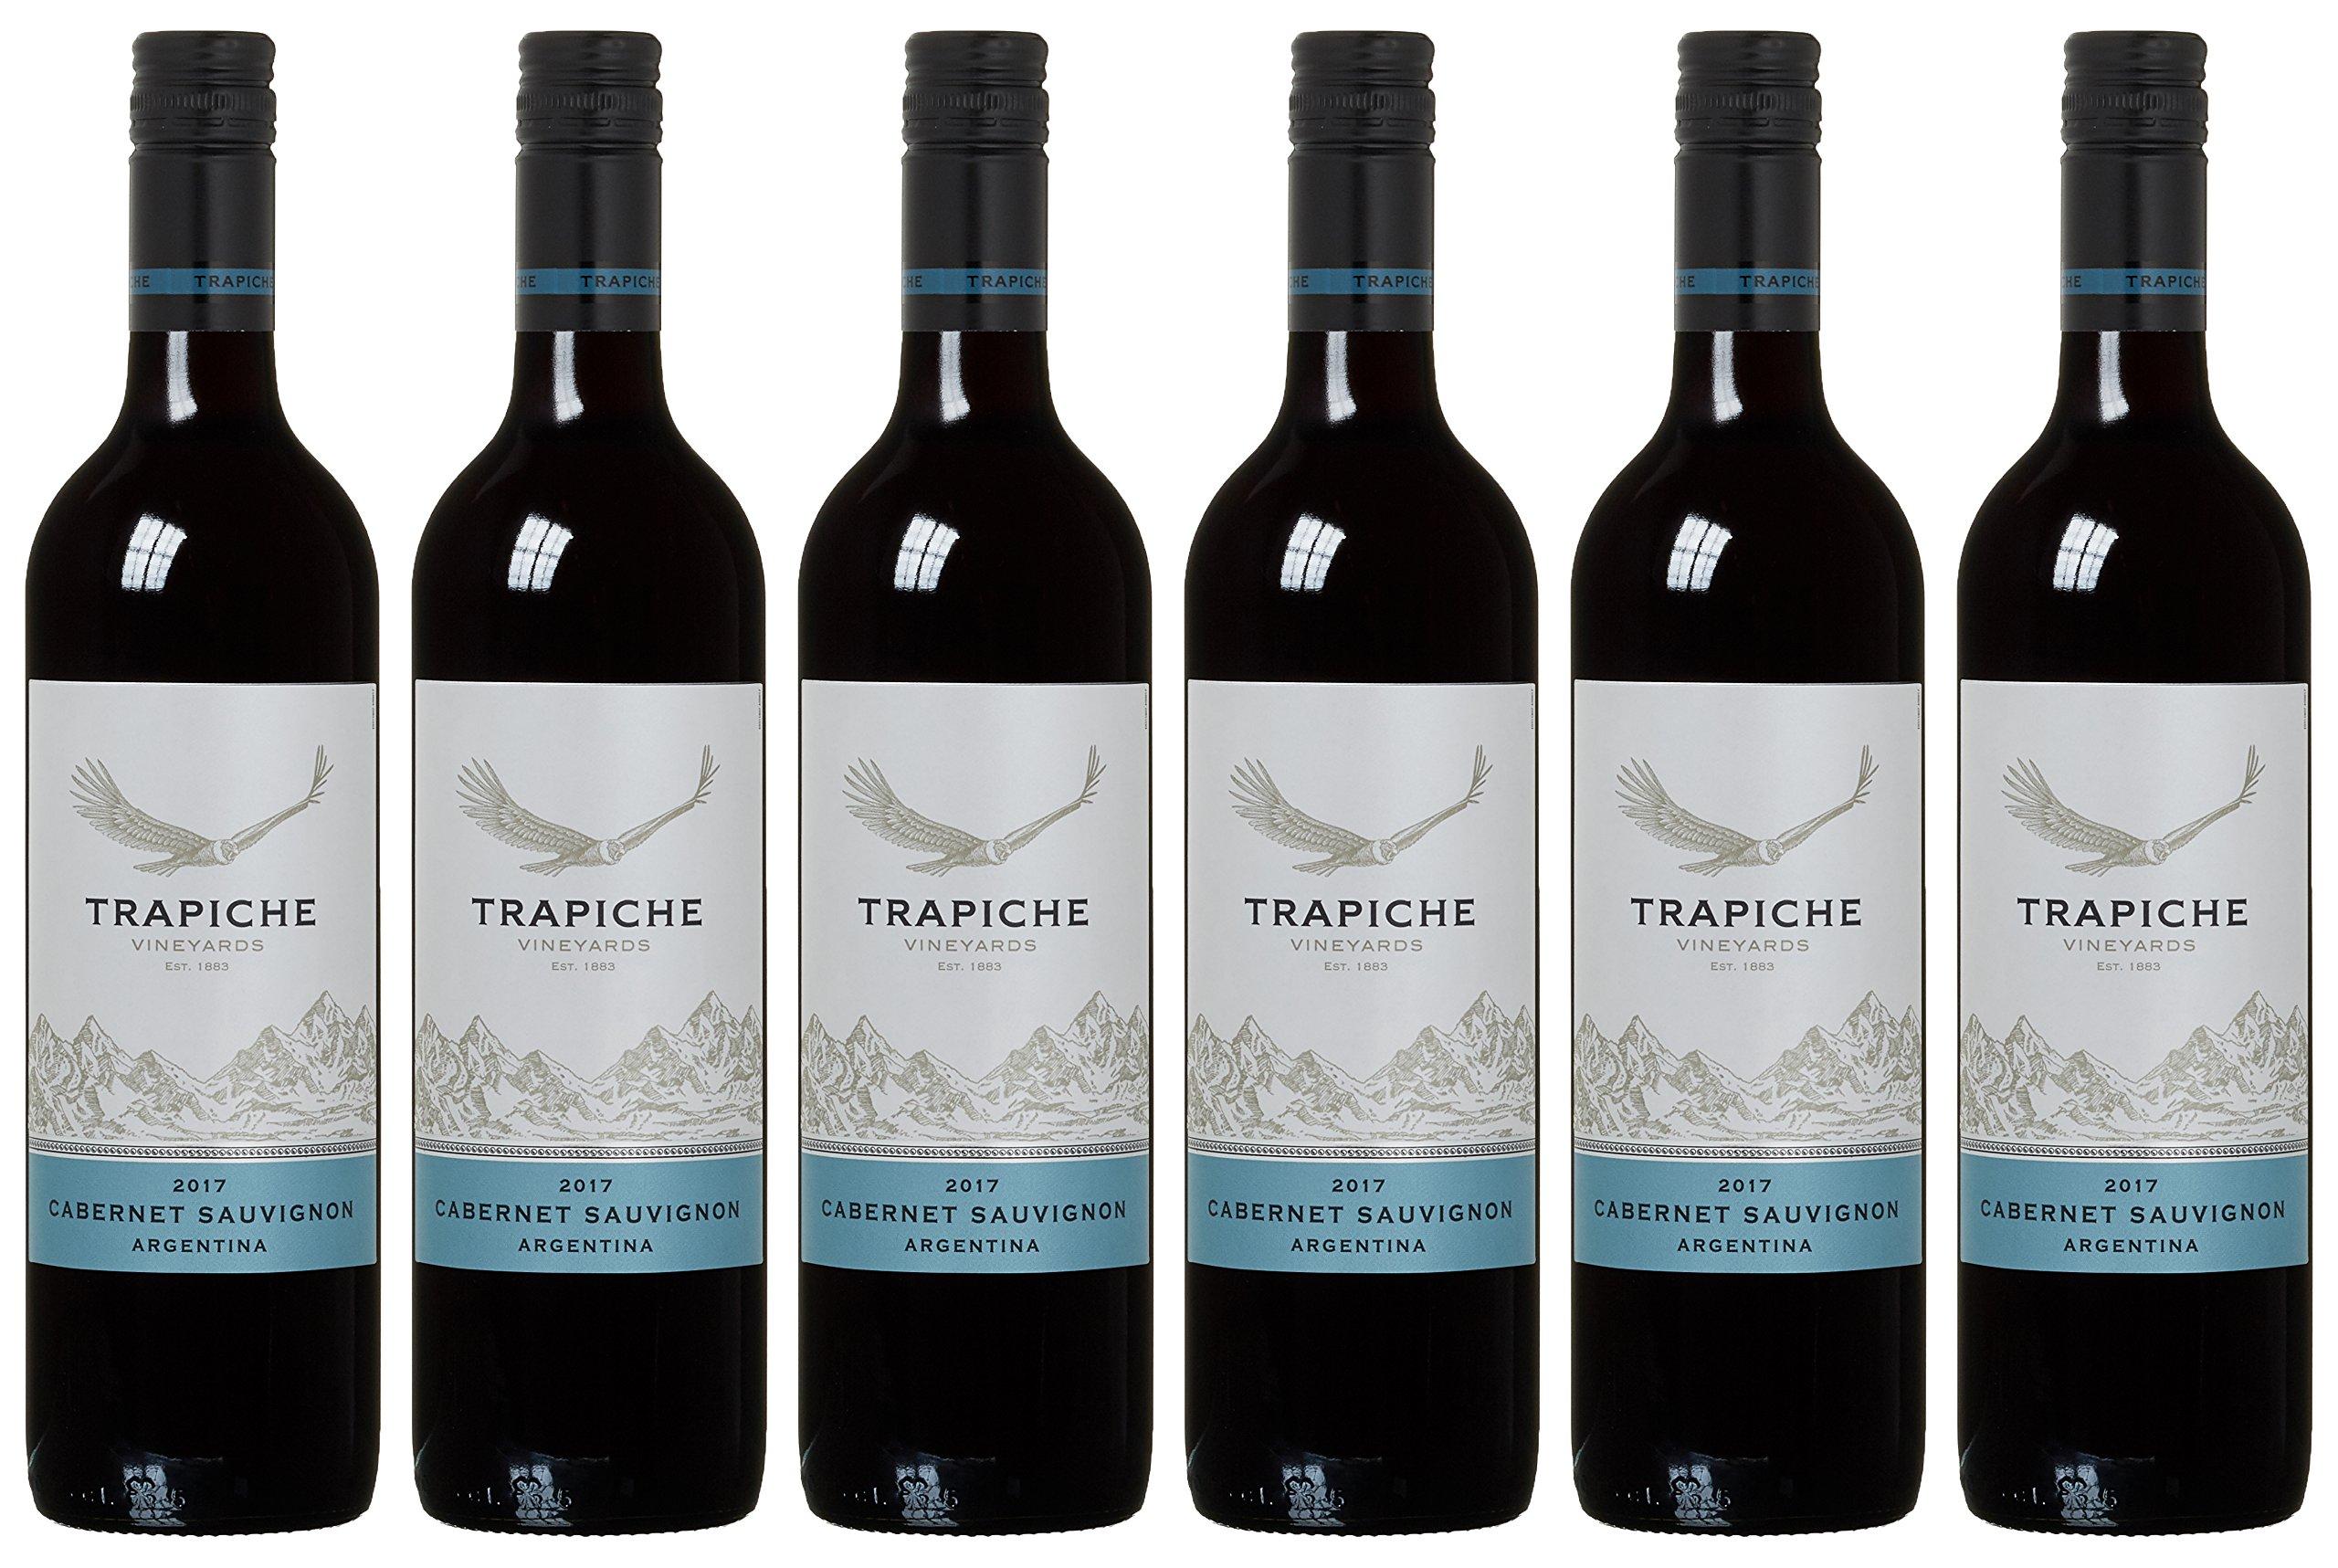 Bodegas-Trapiche-Varietals-Cabernet-Sauvignon-2015-Trocken-6-x-075-l